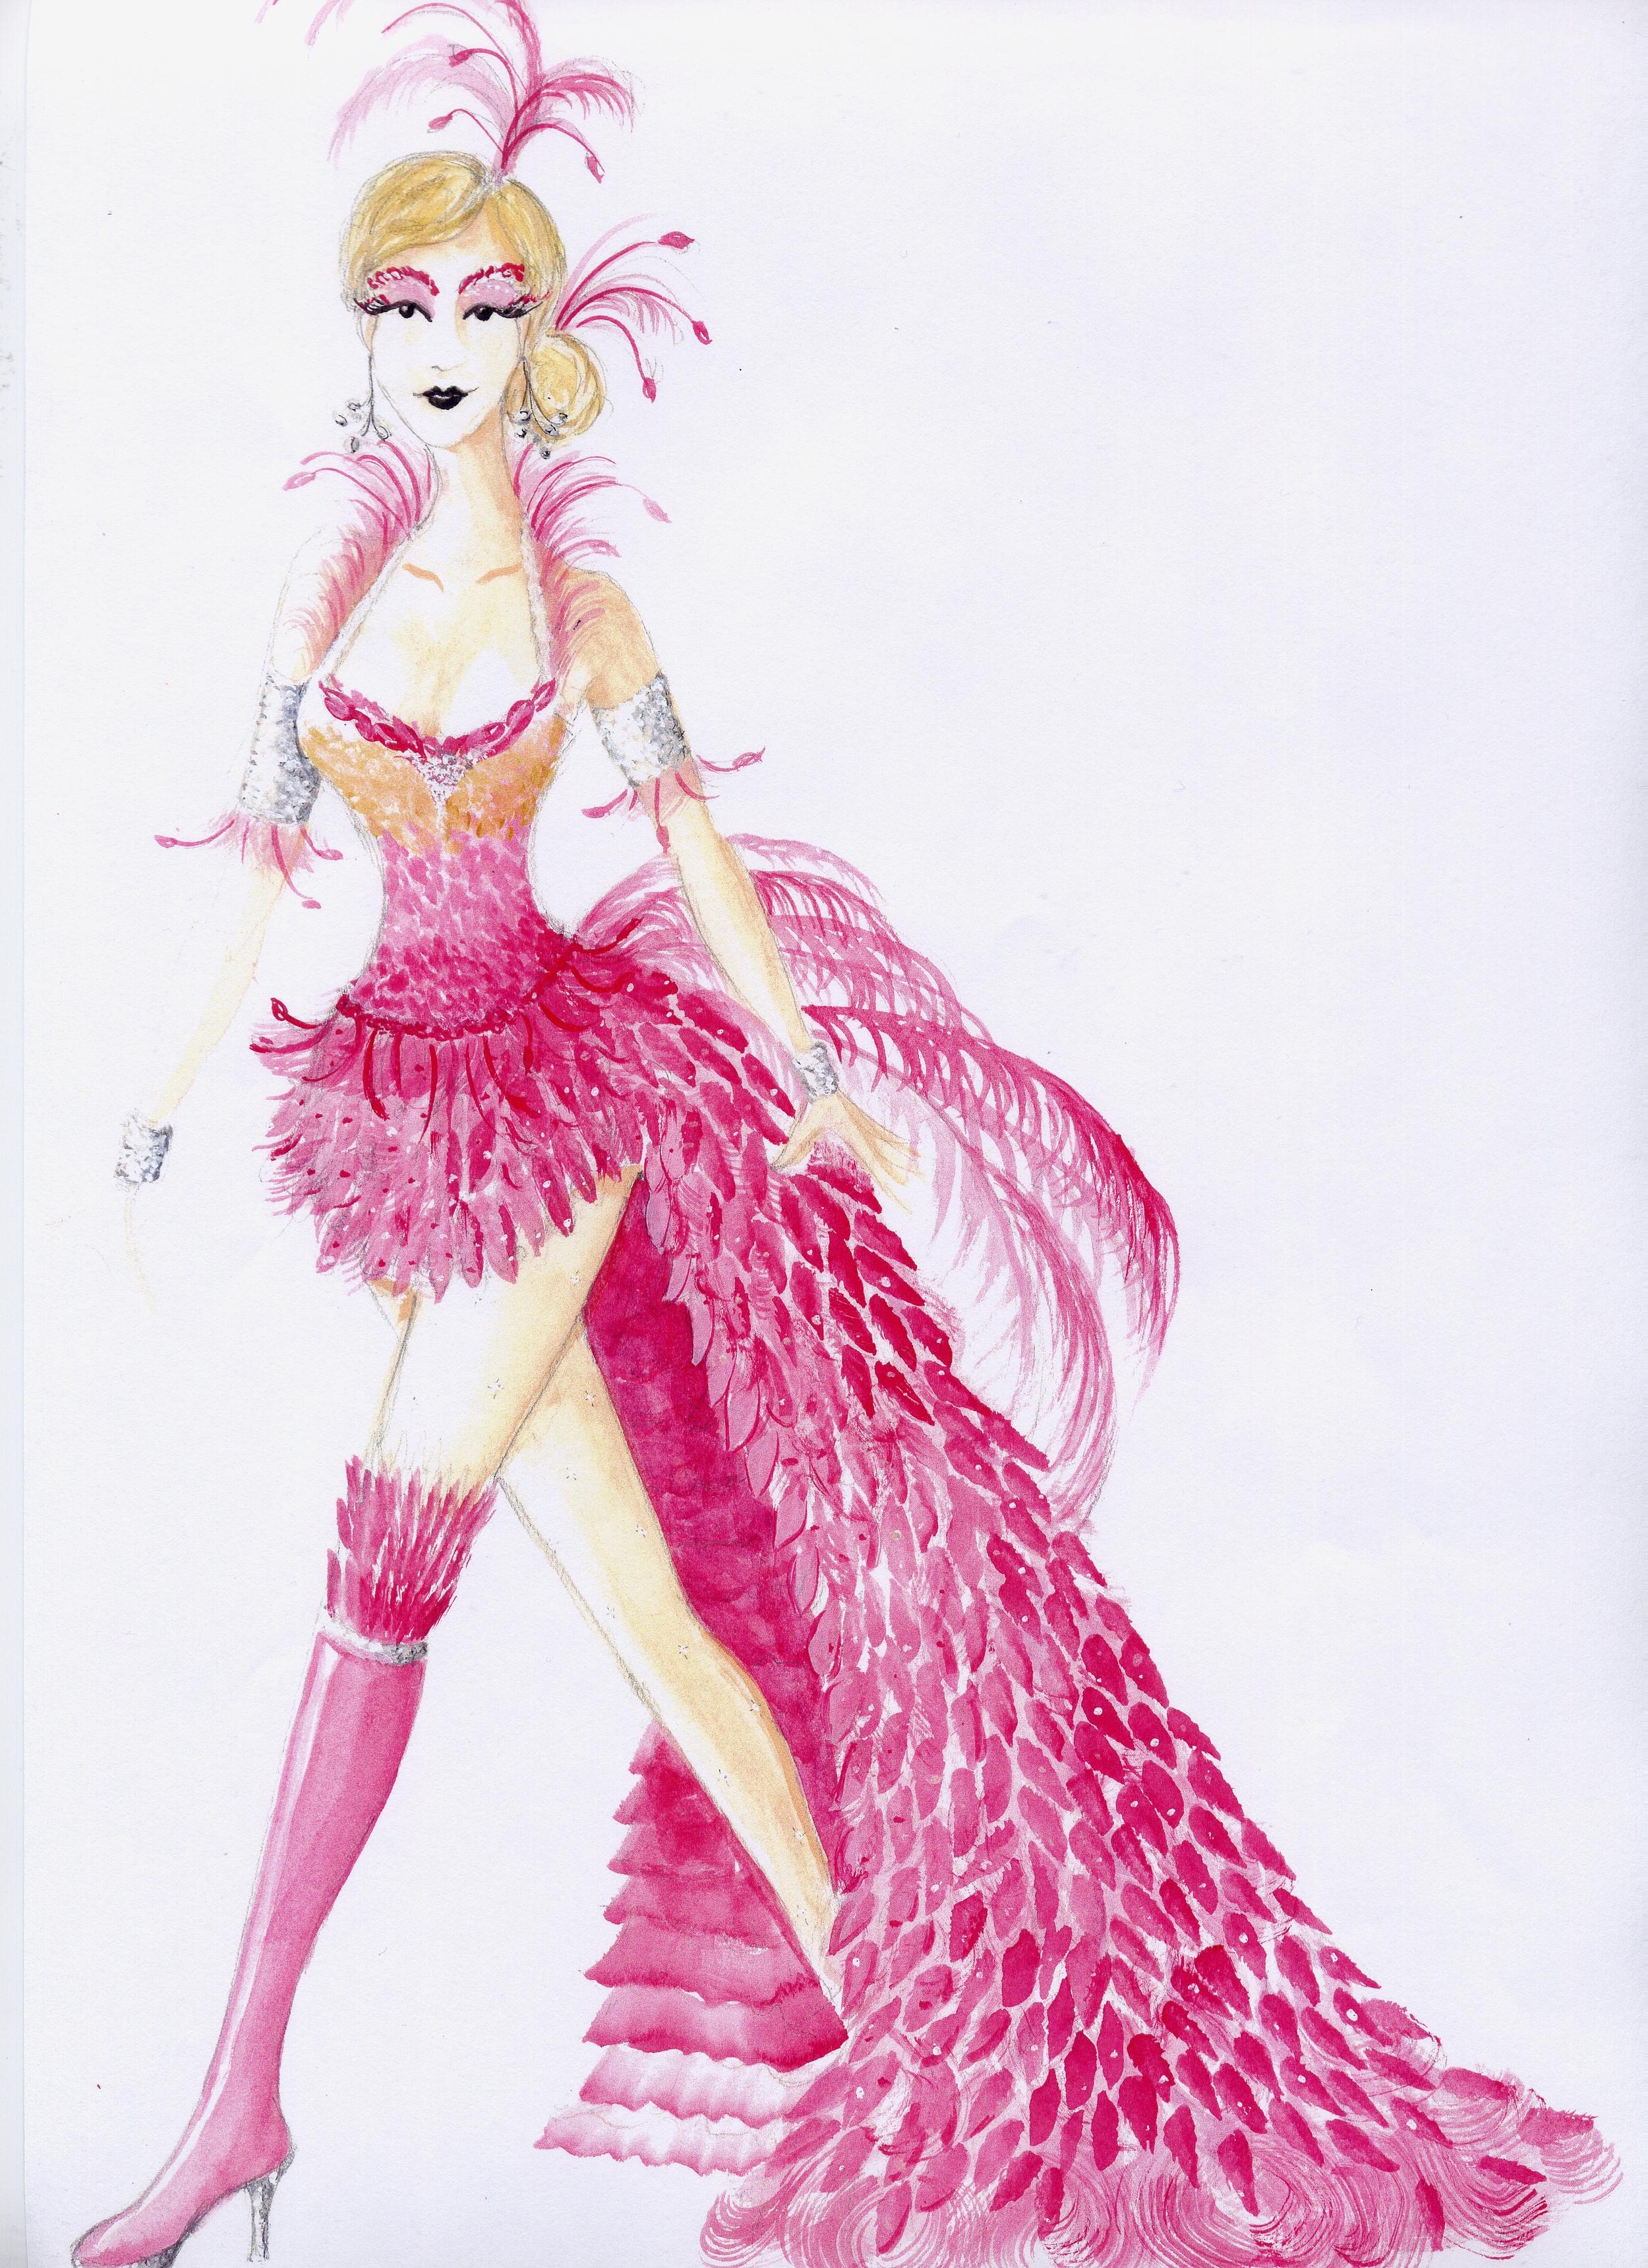 Flamingo costume rendering